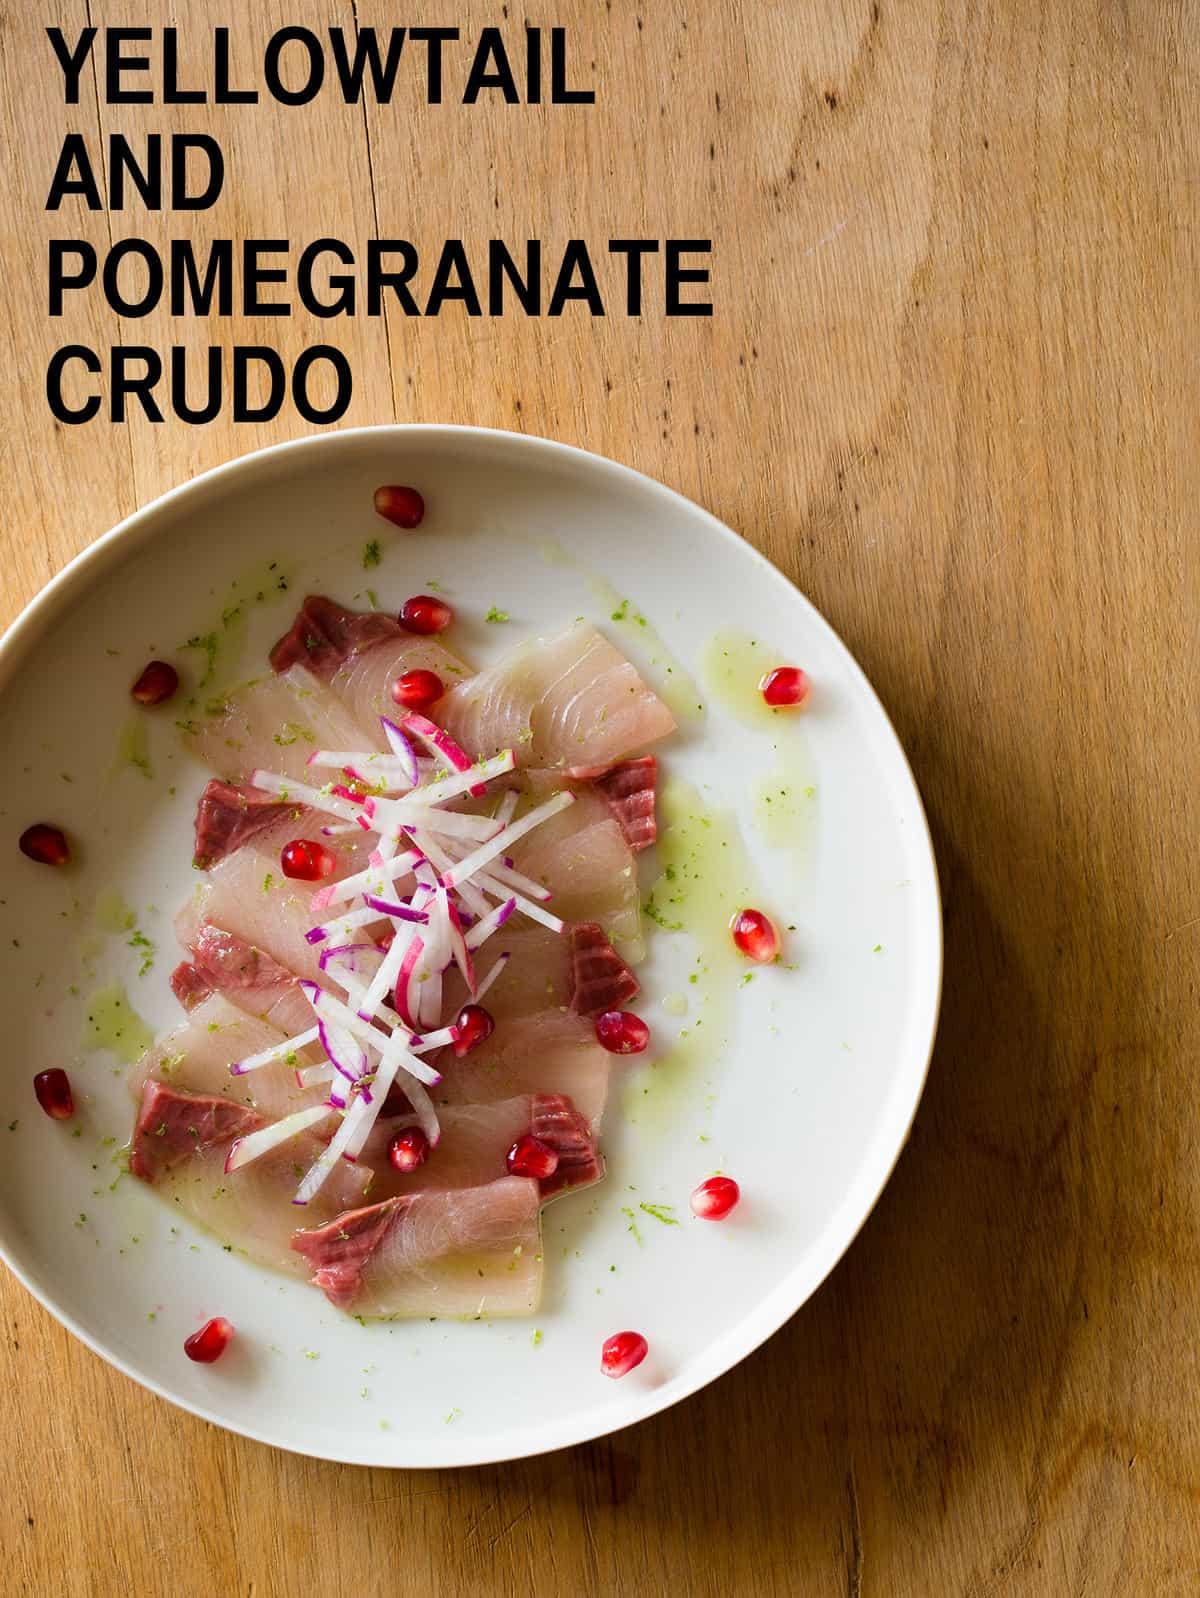 Yellowtail Pomegranate Crudo Spoon Fork Bacon